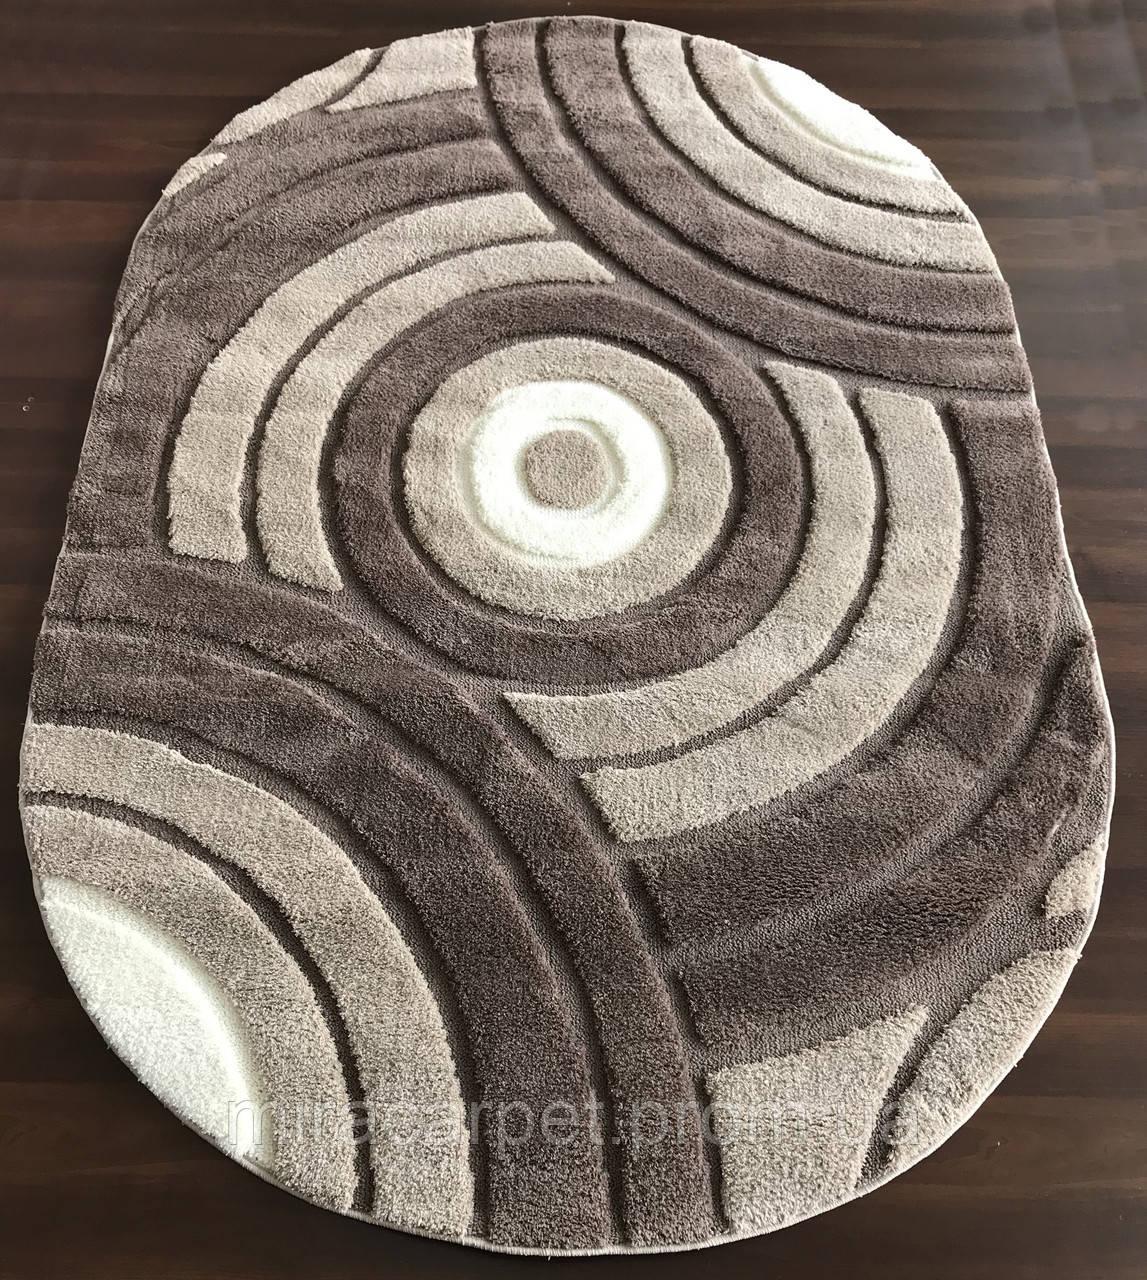 Мягкие мохнатые ковры